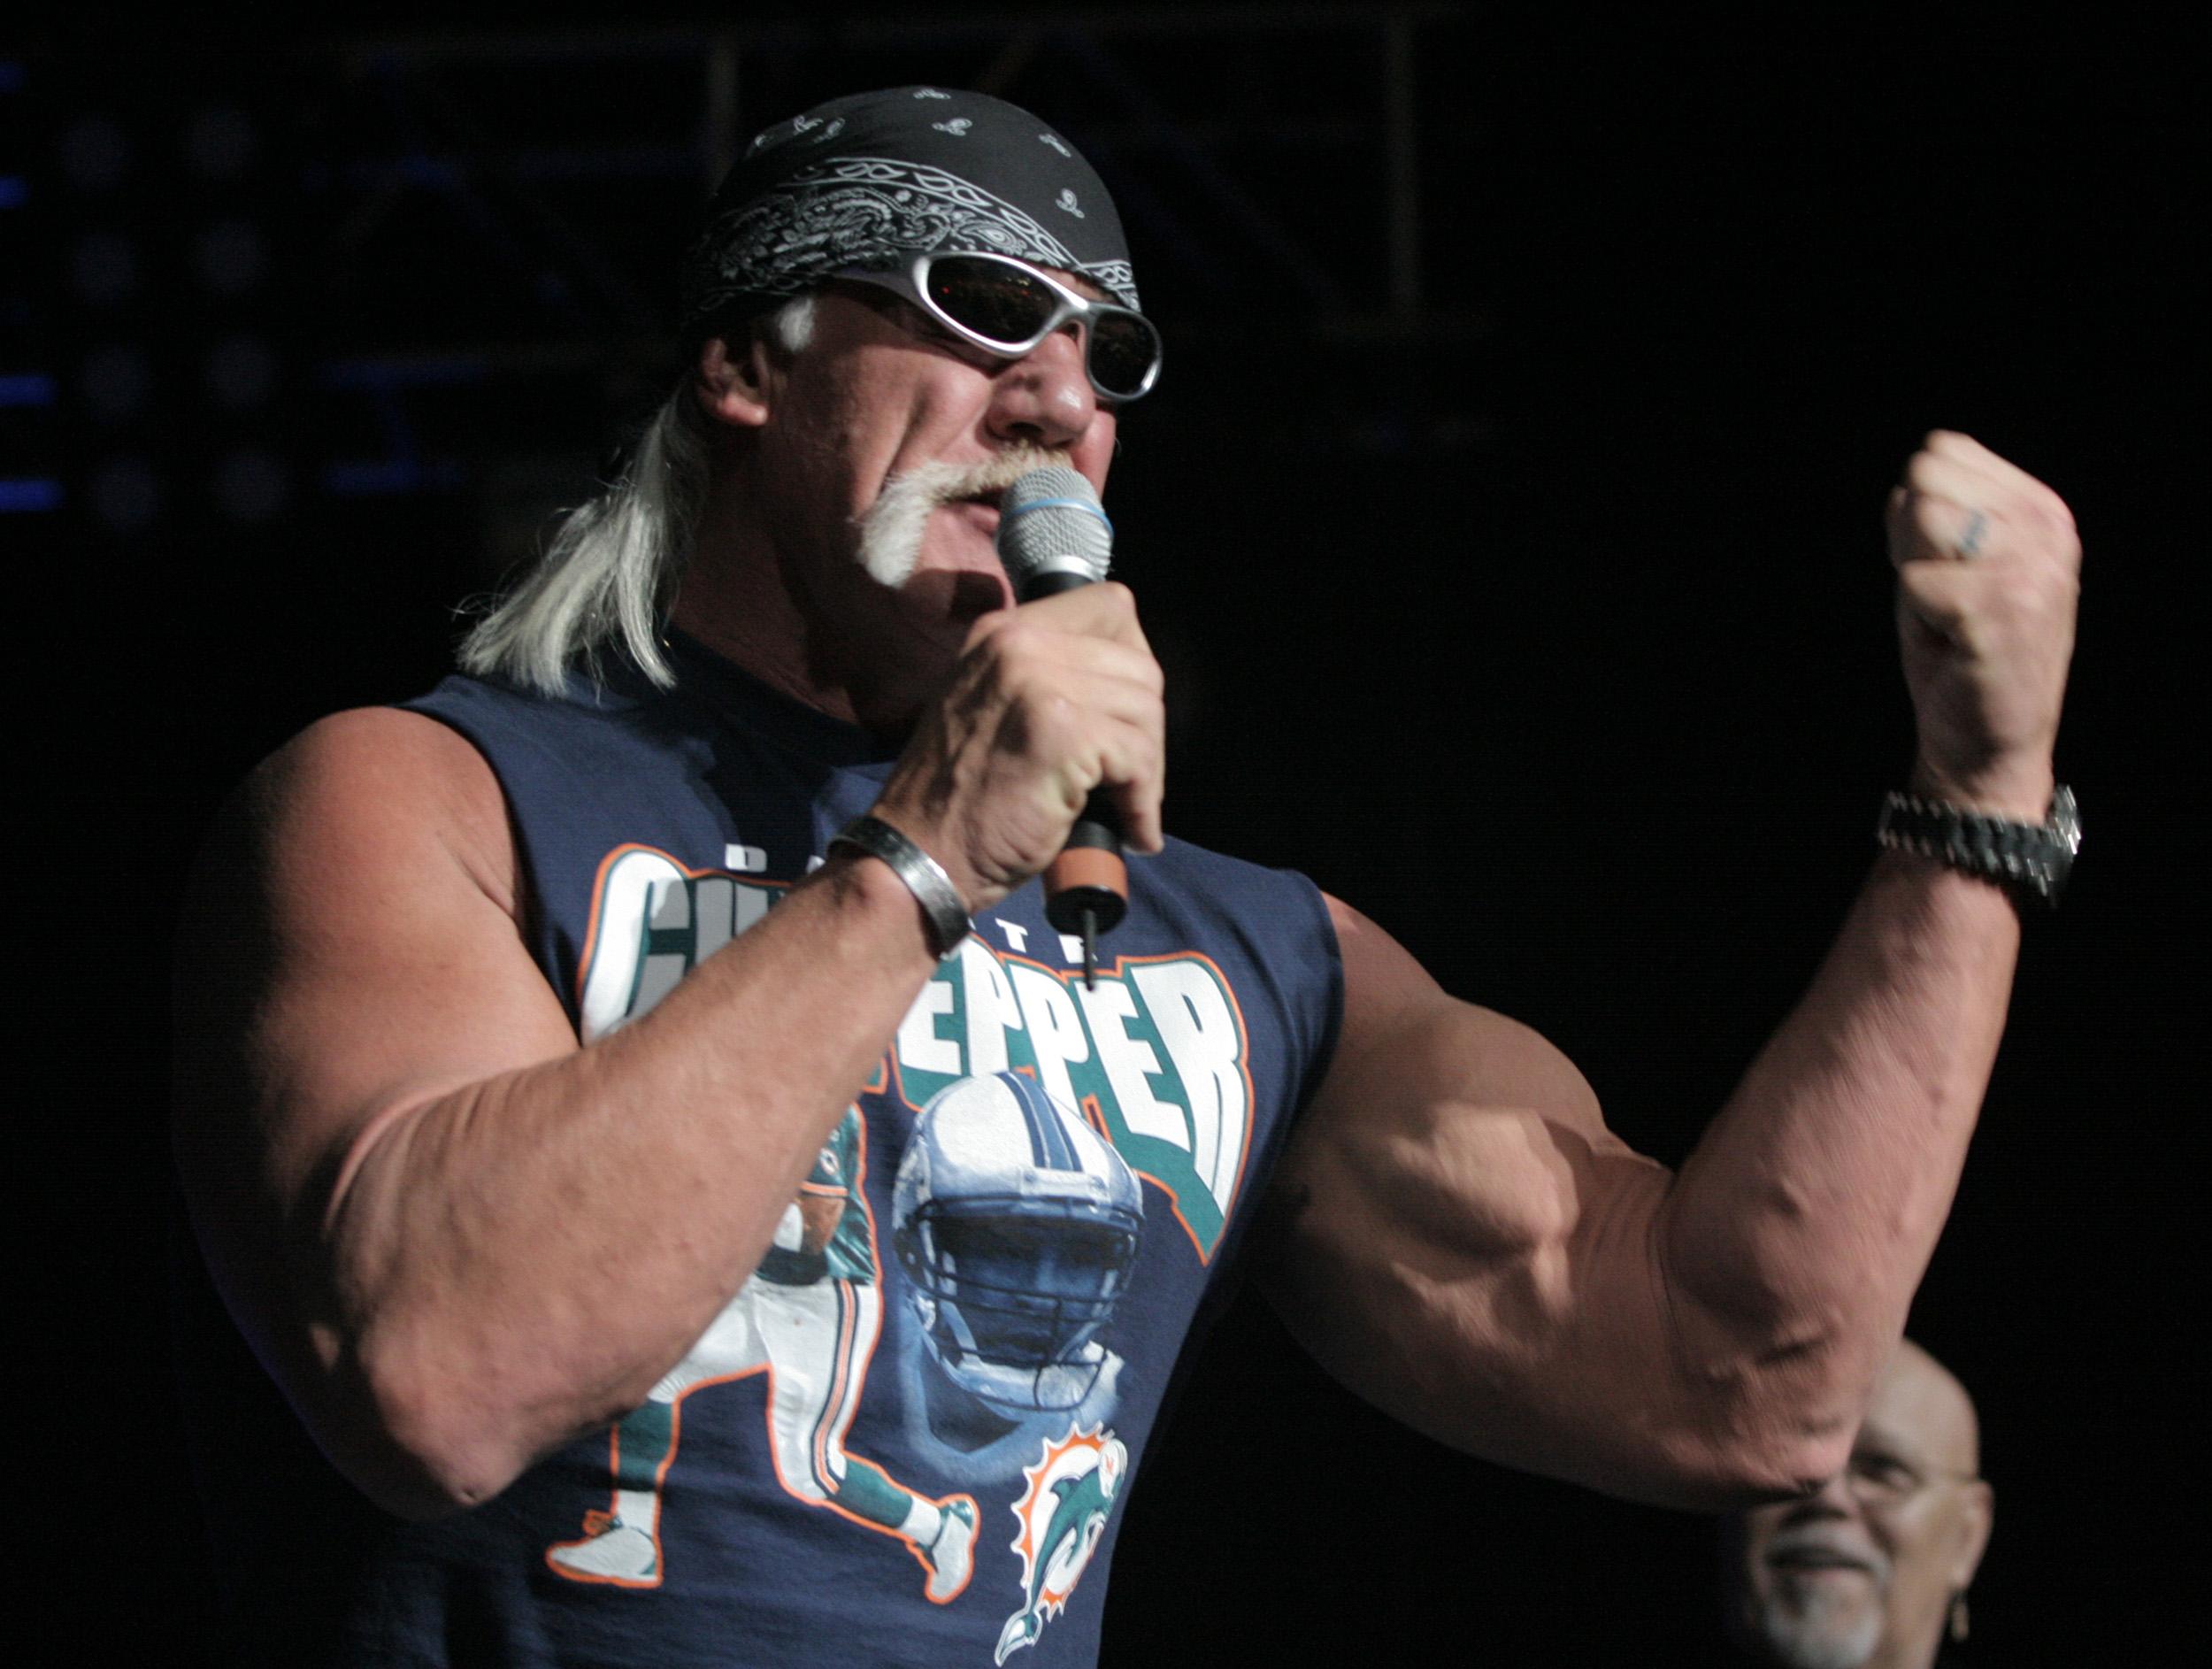 Hulk Hogan (Terry Bollea)